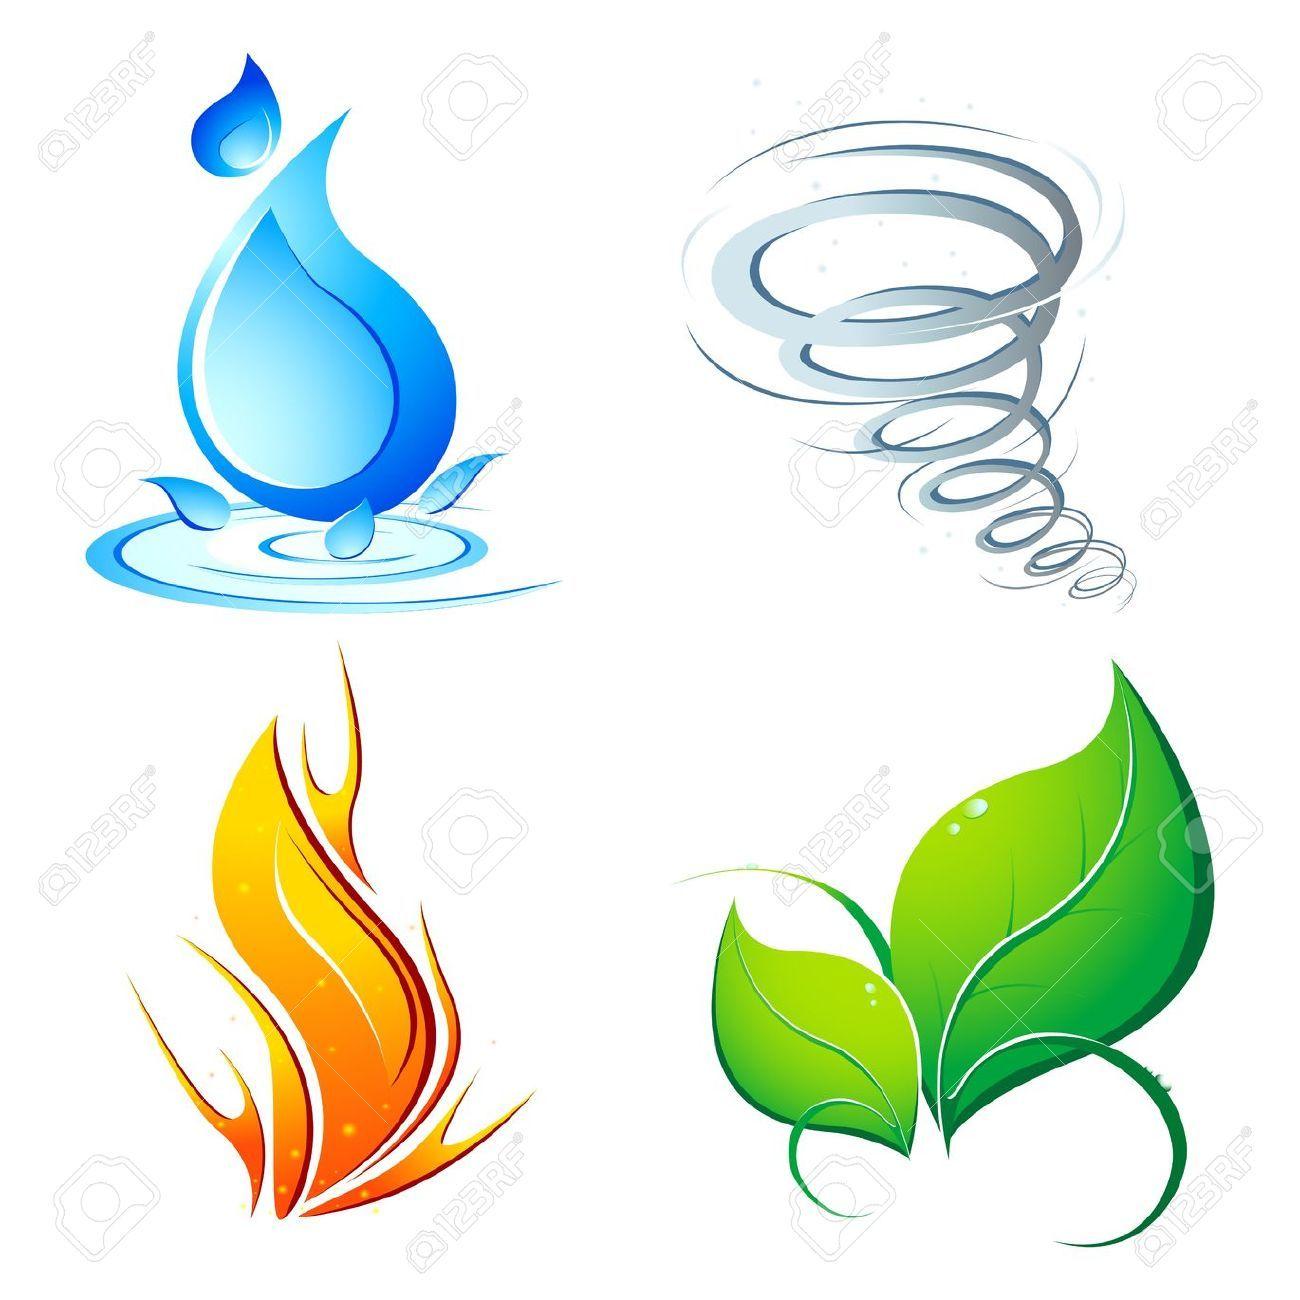 symbole element - Recherche Google | Element symbols